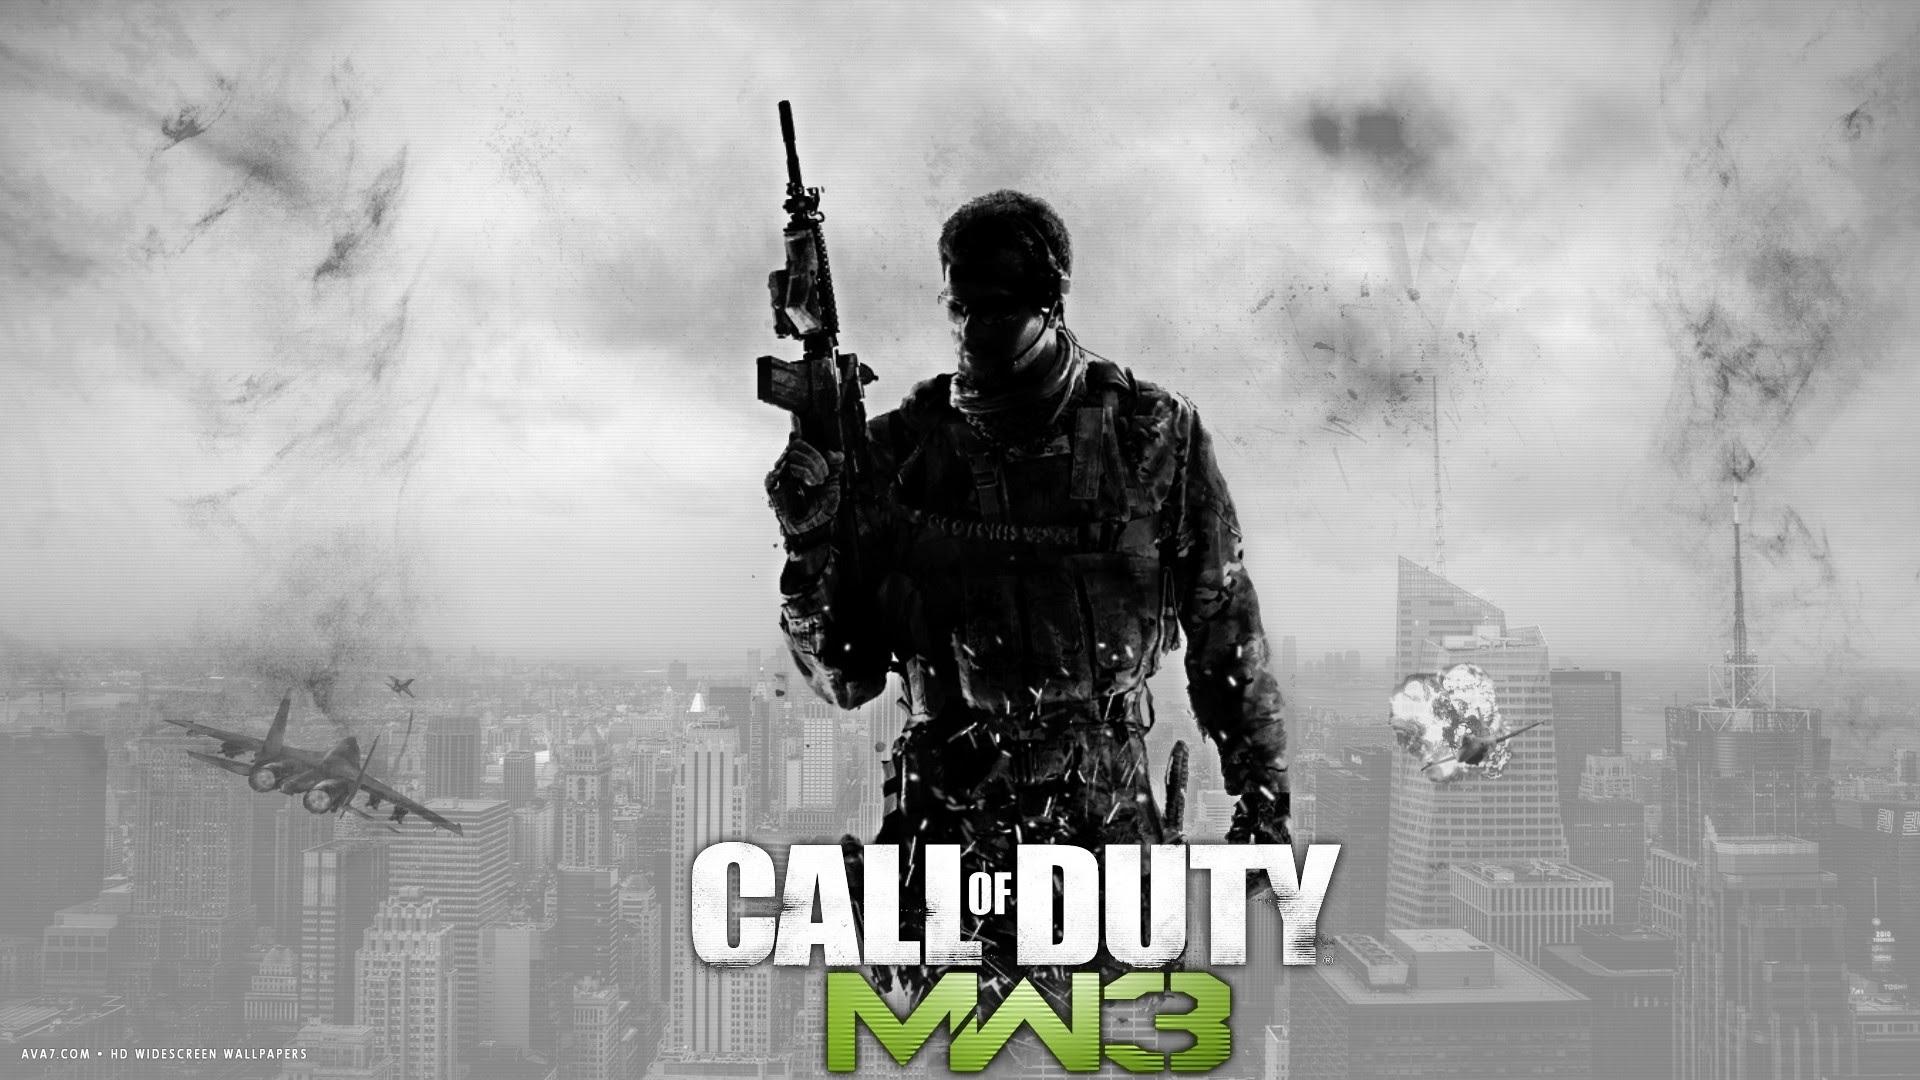 Call Of Duty Modern Warfare 3 Game Mw3 Hd Widescreen Wallpaper